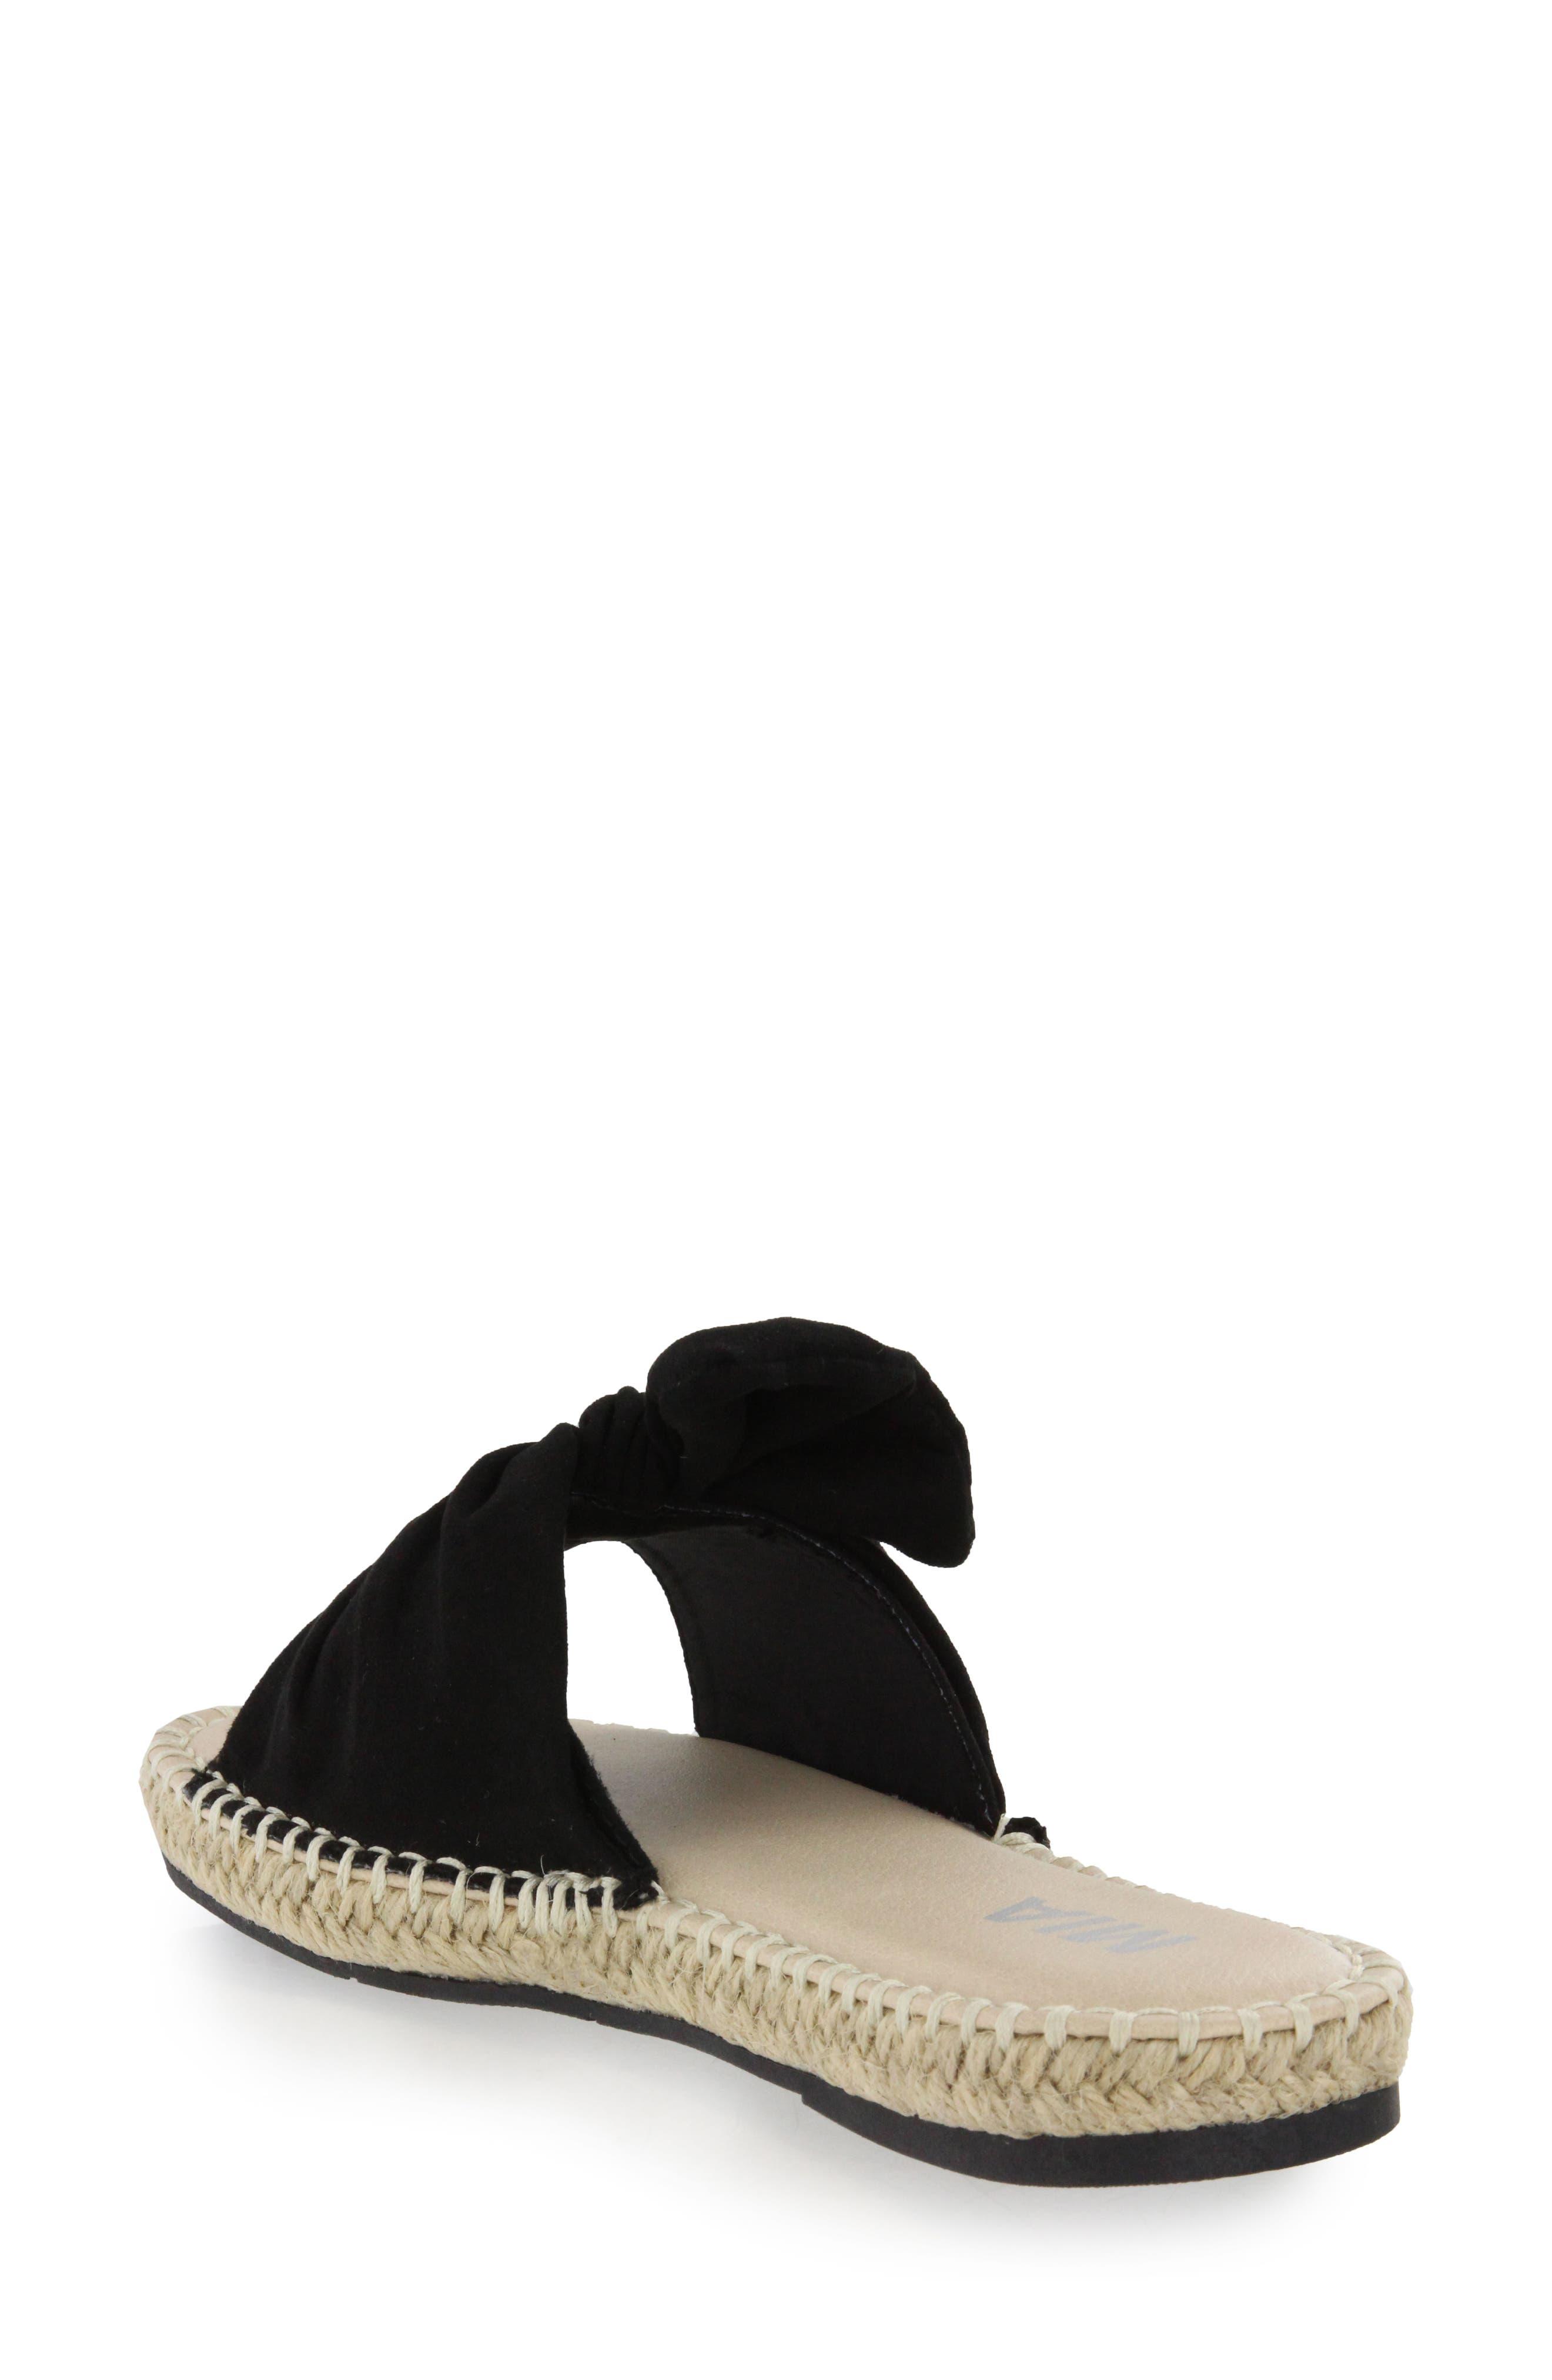 Kensi Knotted Slide Sandal,                             Alternate thumbnail 2, color,                             001